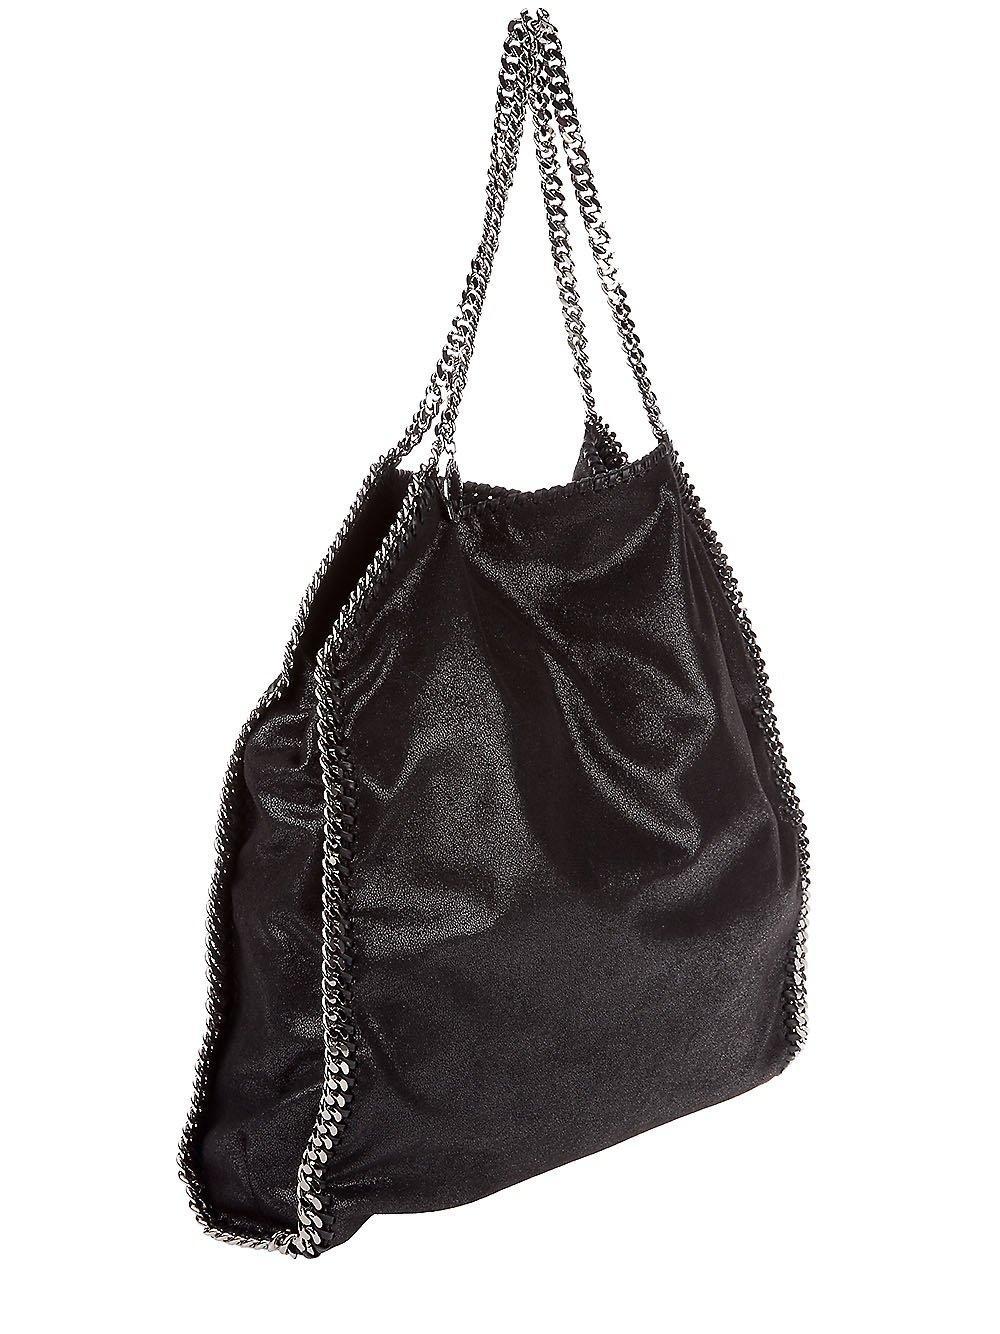 Stella Mccartney Black Falabella Tote Bag. Stella mccartney Falabella Large  Faux-Python ... 21f14314d649d